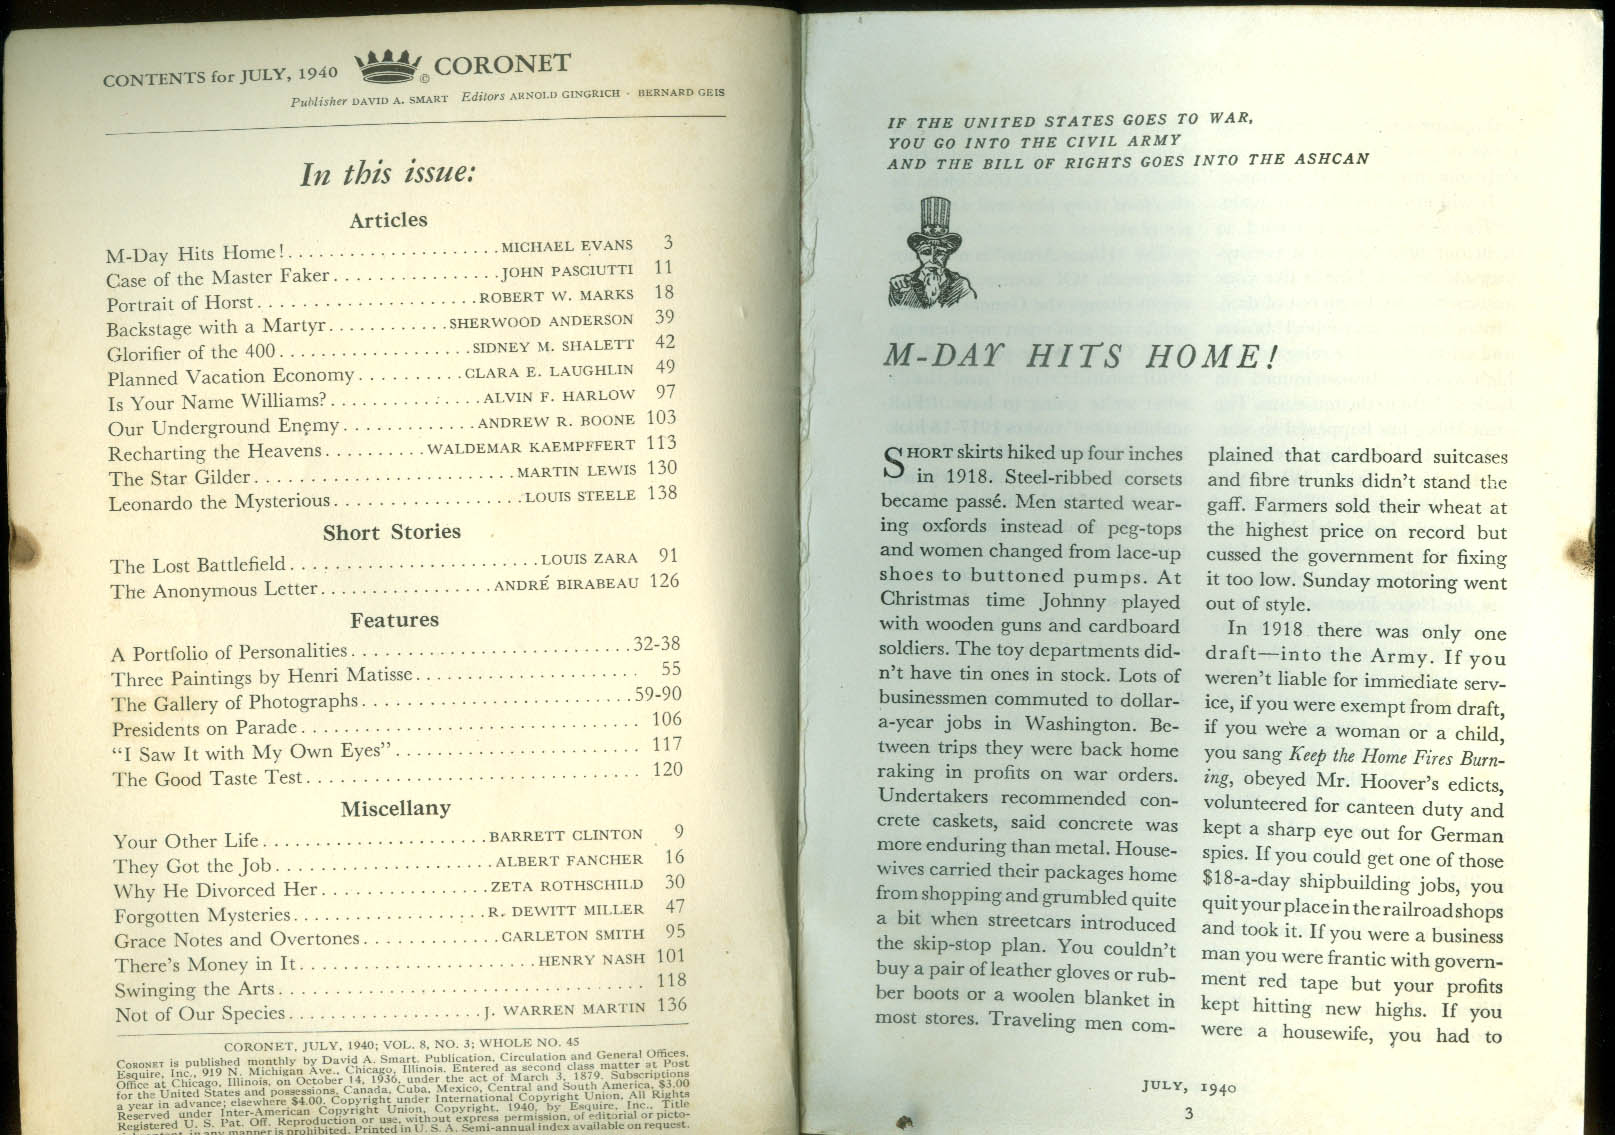 CORONET 7 1940 Dossena da Vinci James Wong Howe Brassai Horst Kertesz Lange